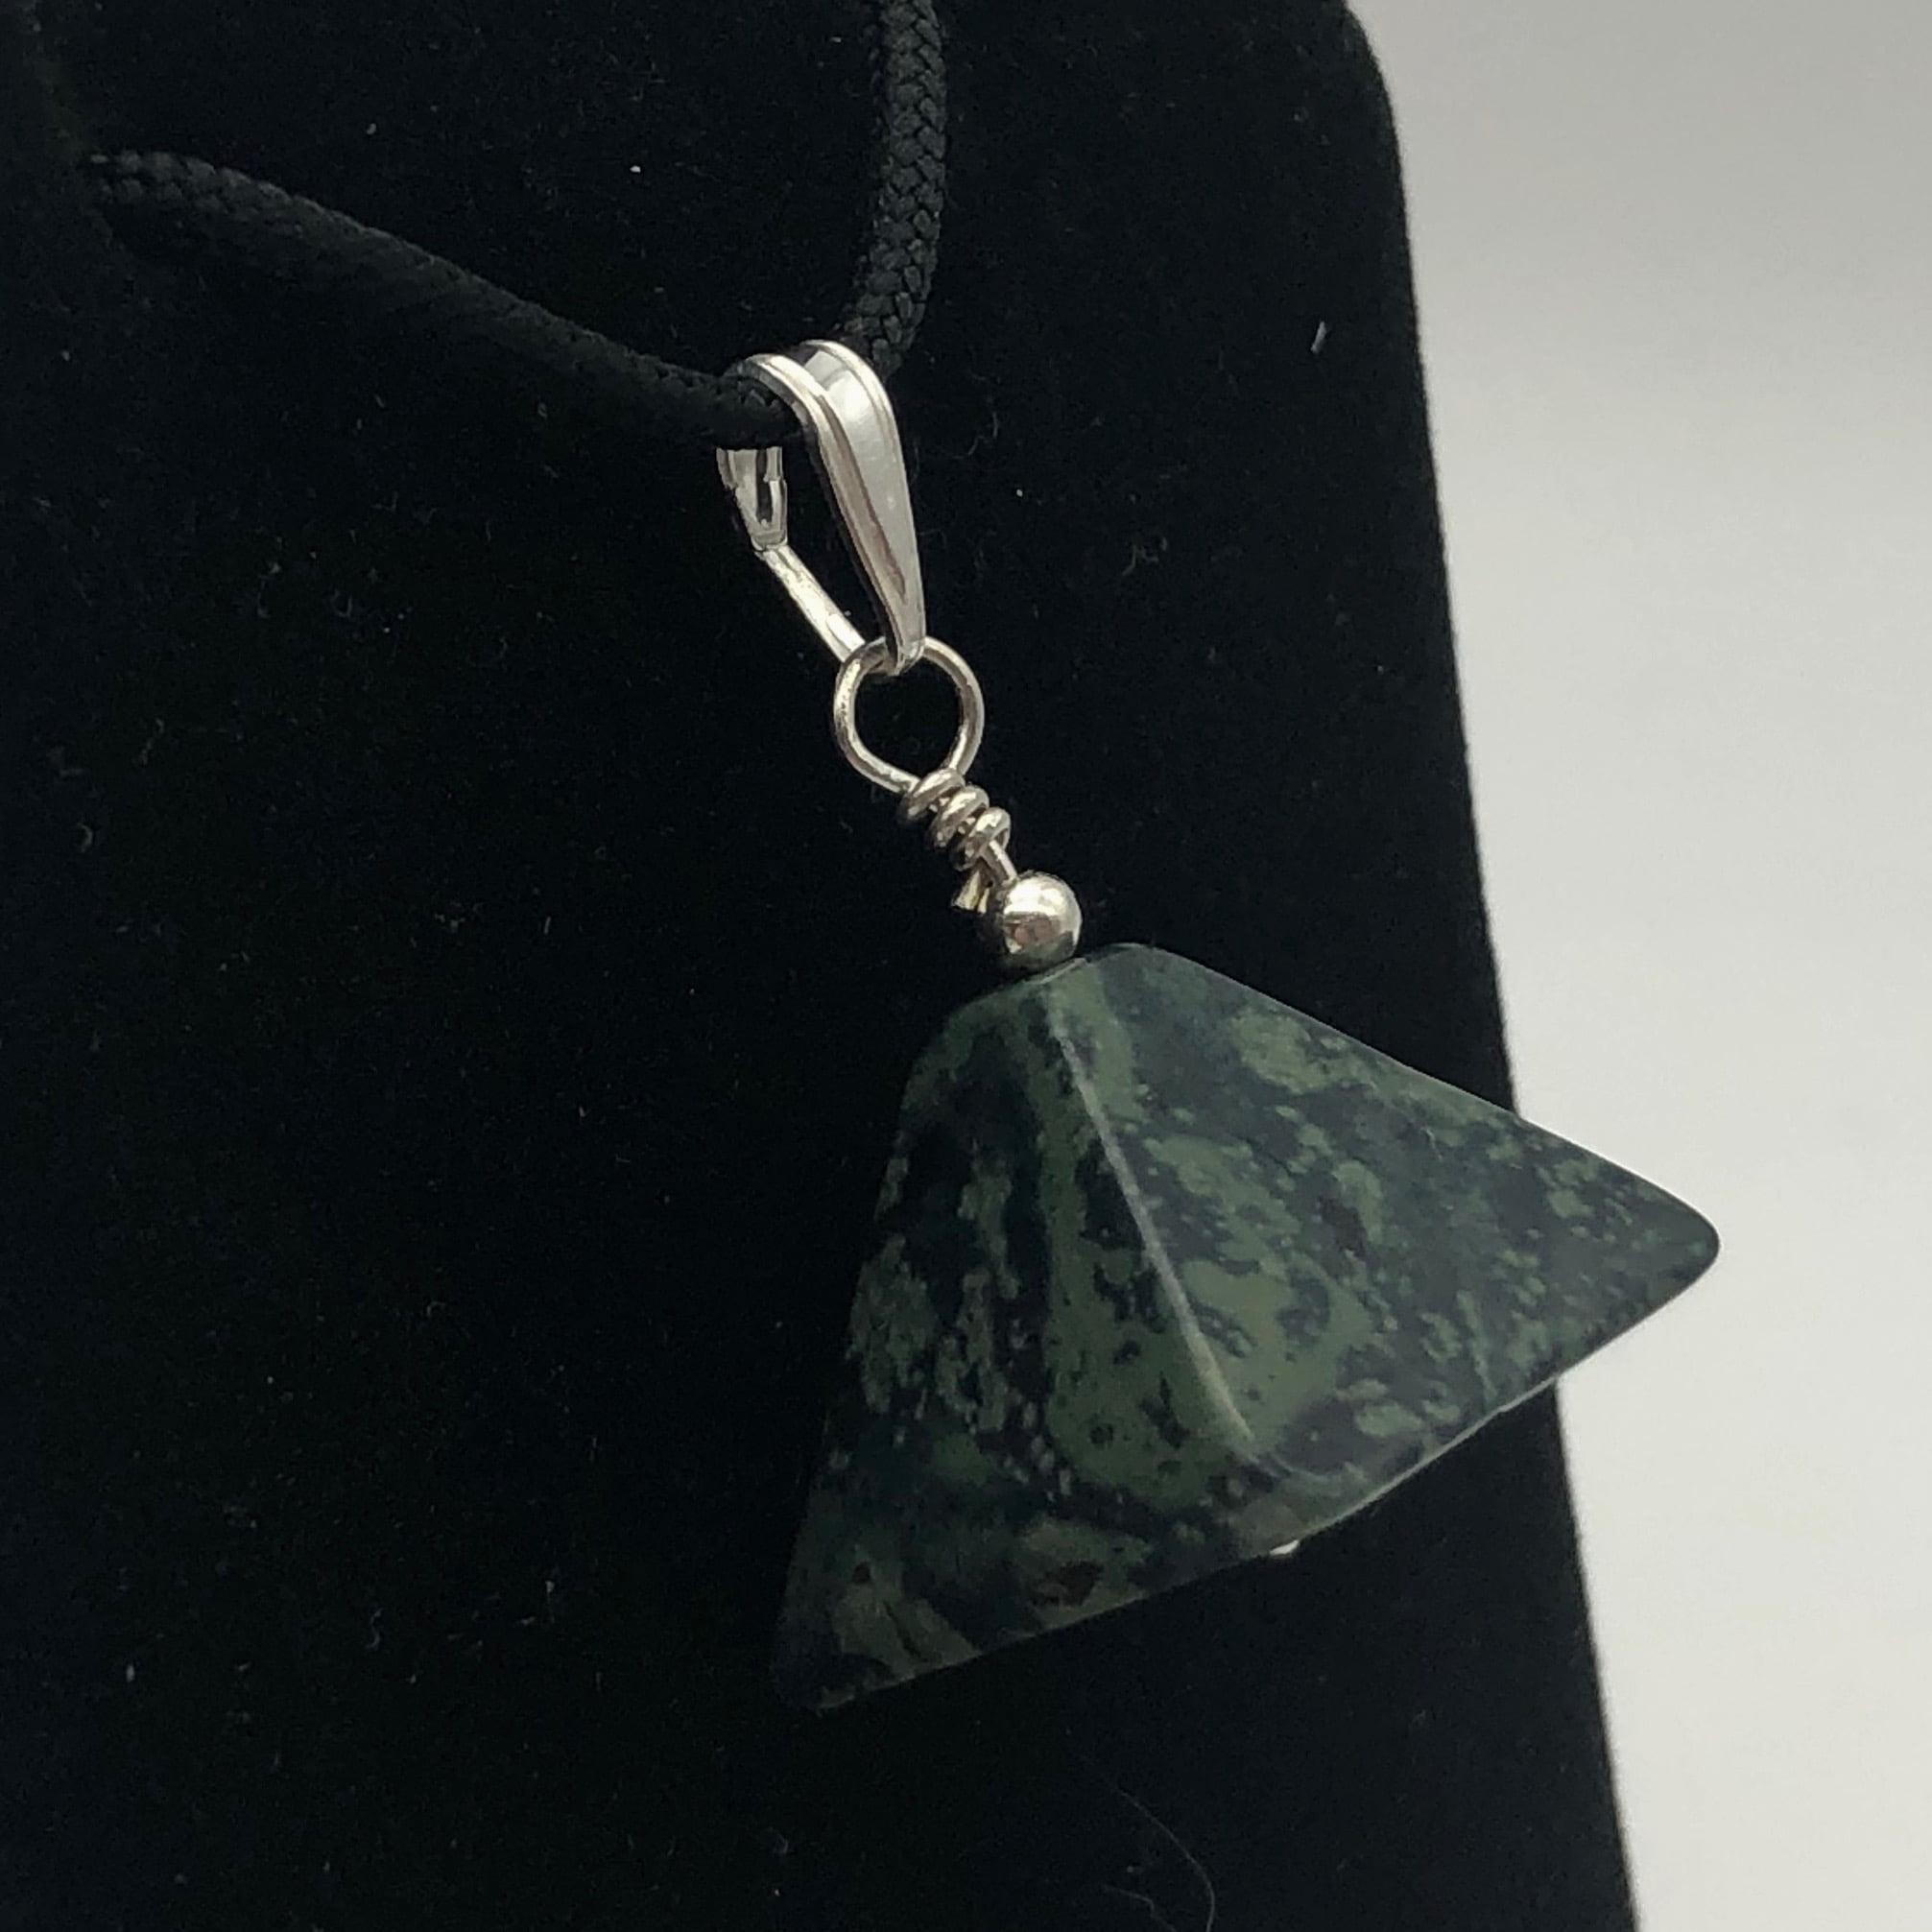 Macram\u00e9 necklace and pop jasper pendant women/'s gift women/'s jewelry micro-macram\u00e9 necklace semi-precious stone necklace